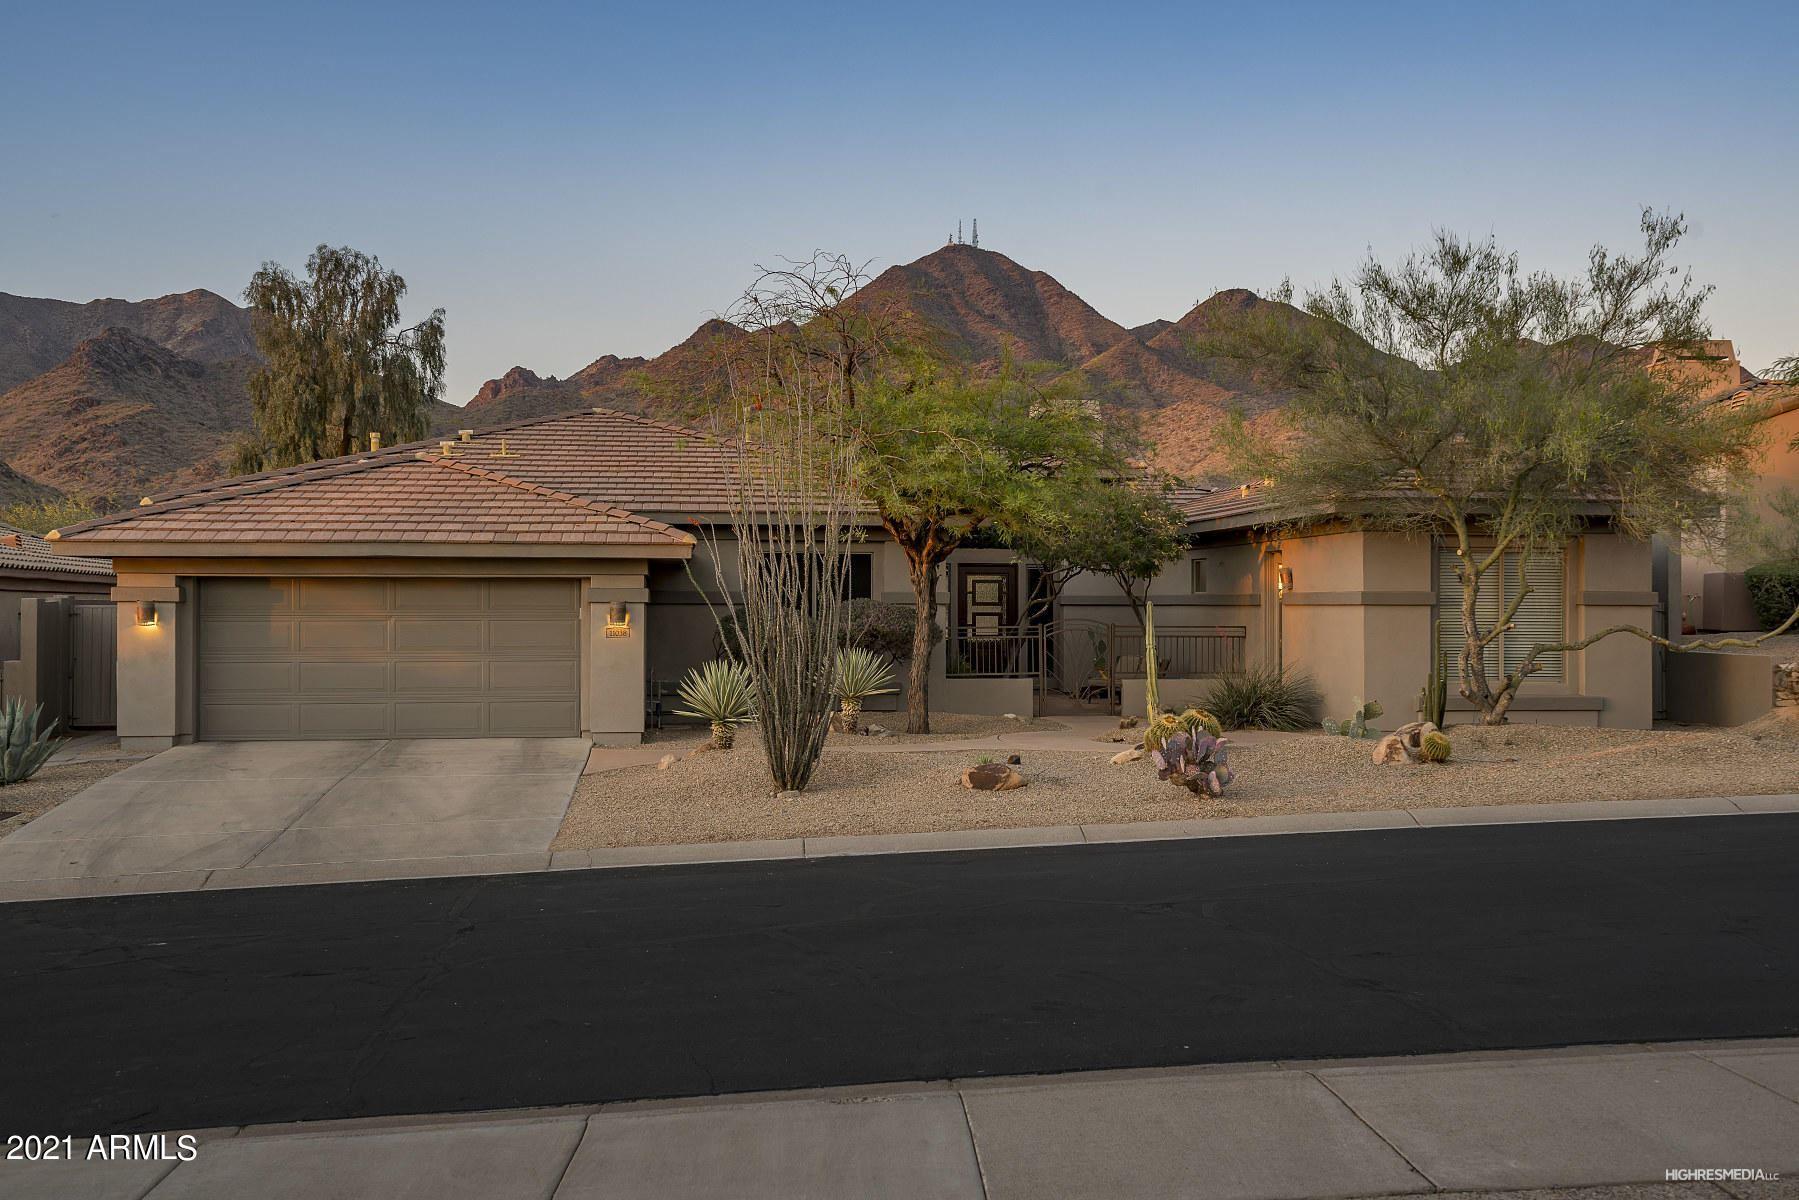 Photo of 11038 E Beck Lane, Scottsdale, AZ 85255 (MLS # 6232812)